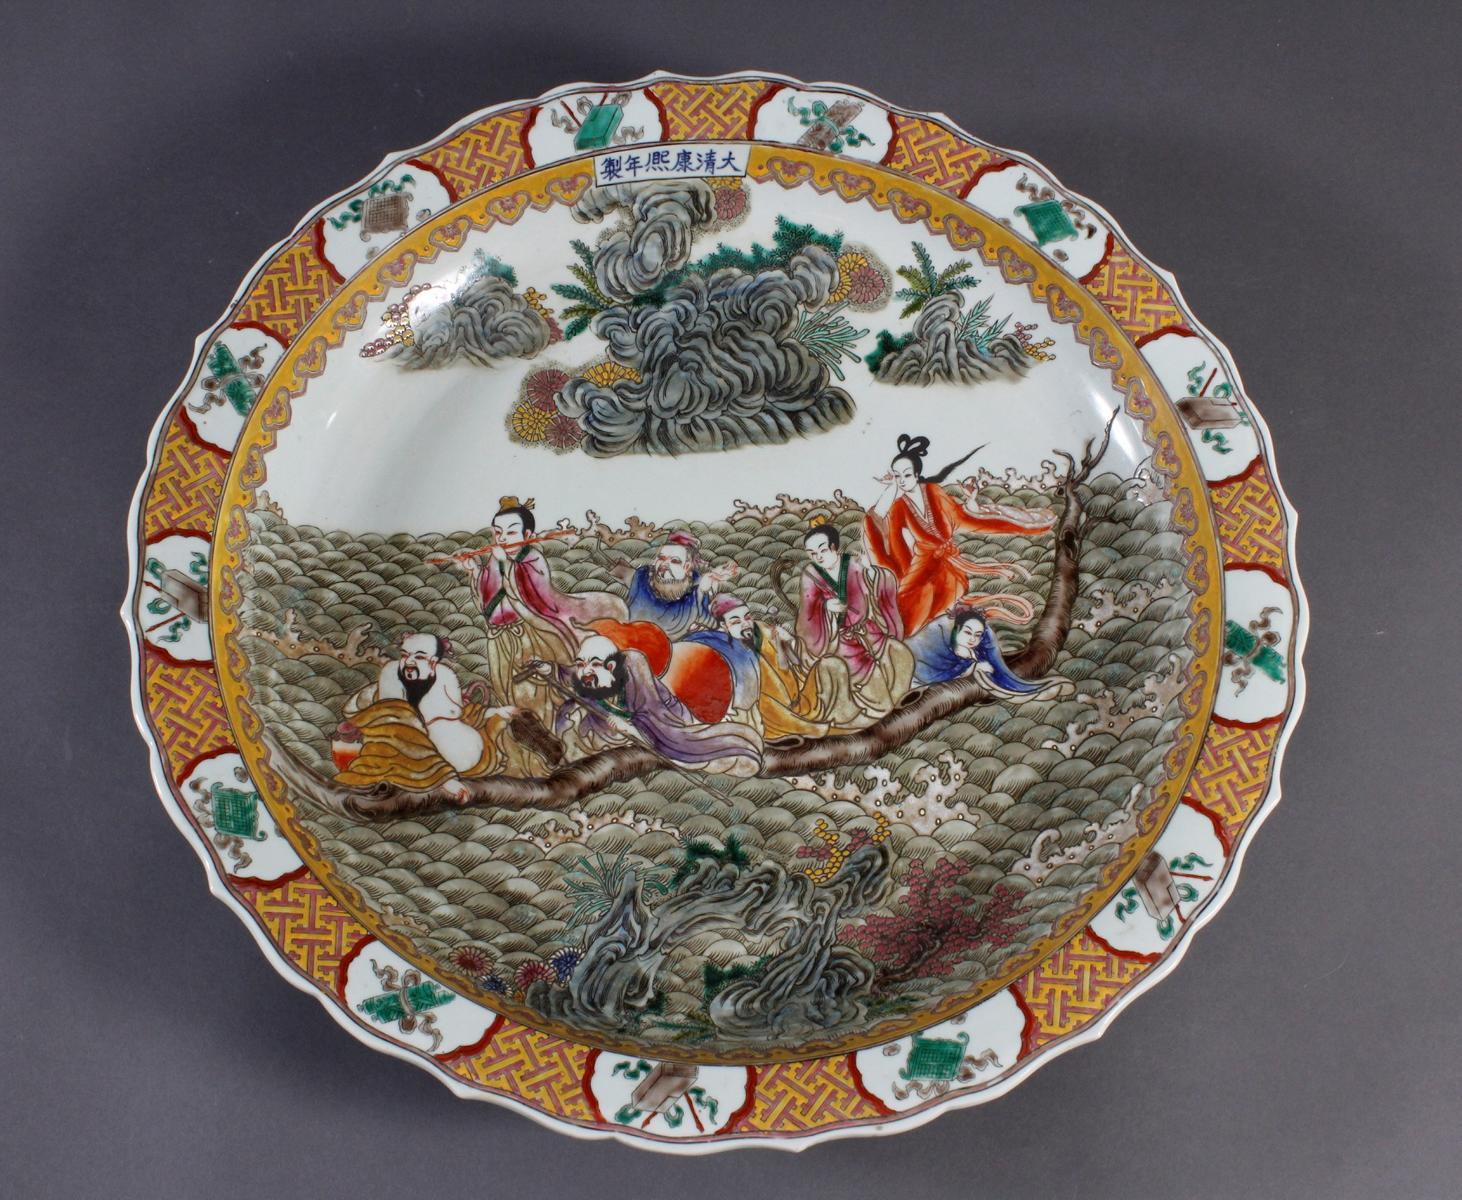 Große Porzellan-Rundplatte, China wohl 20. Jahrhundert